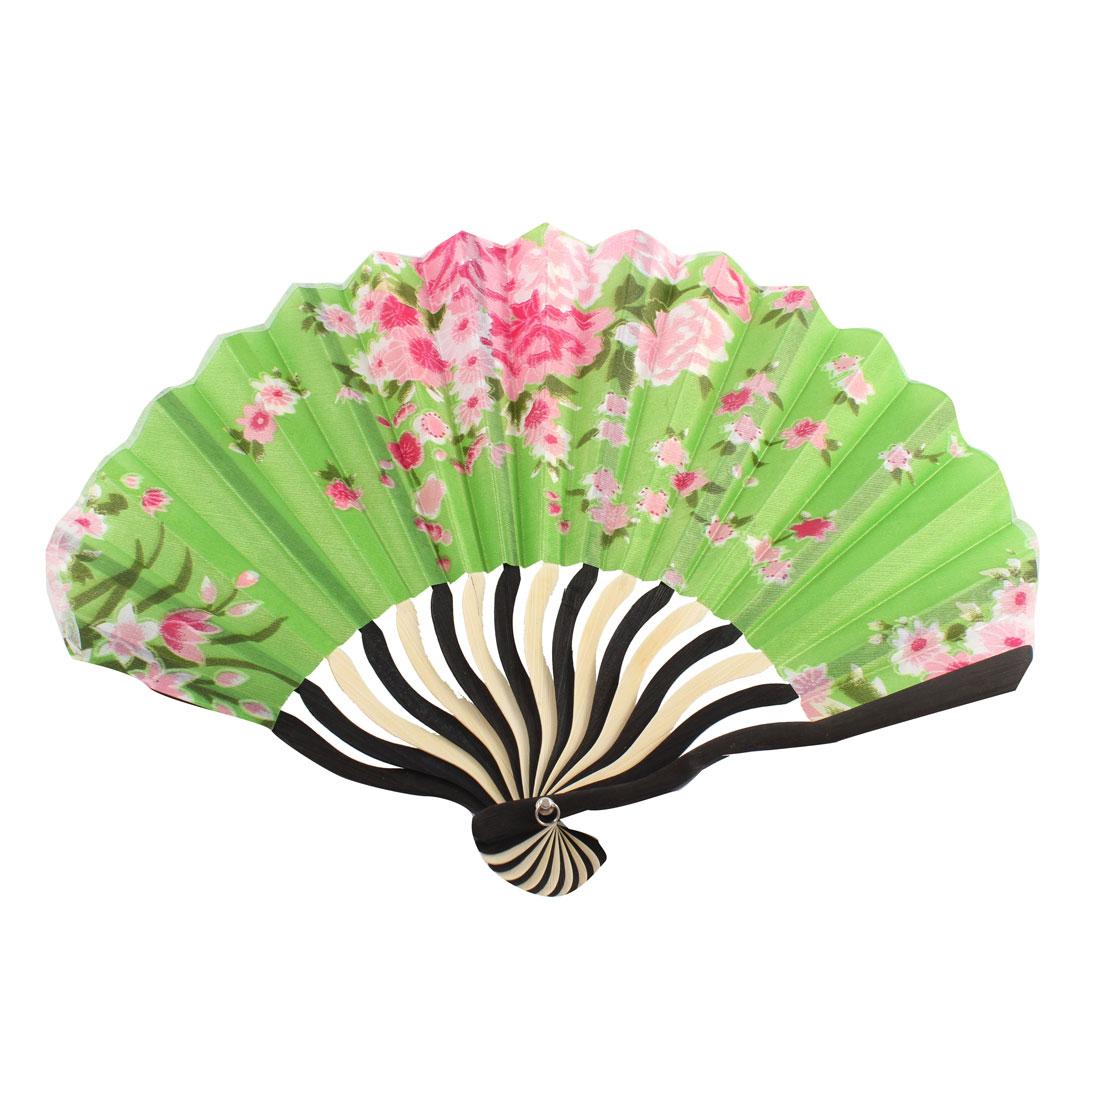 Japanese Style Flower Pattern Nylon Bamboo Rib Fold Hand Fan Fans Art Gift Green For Women